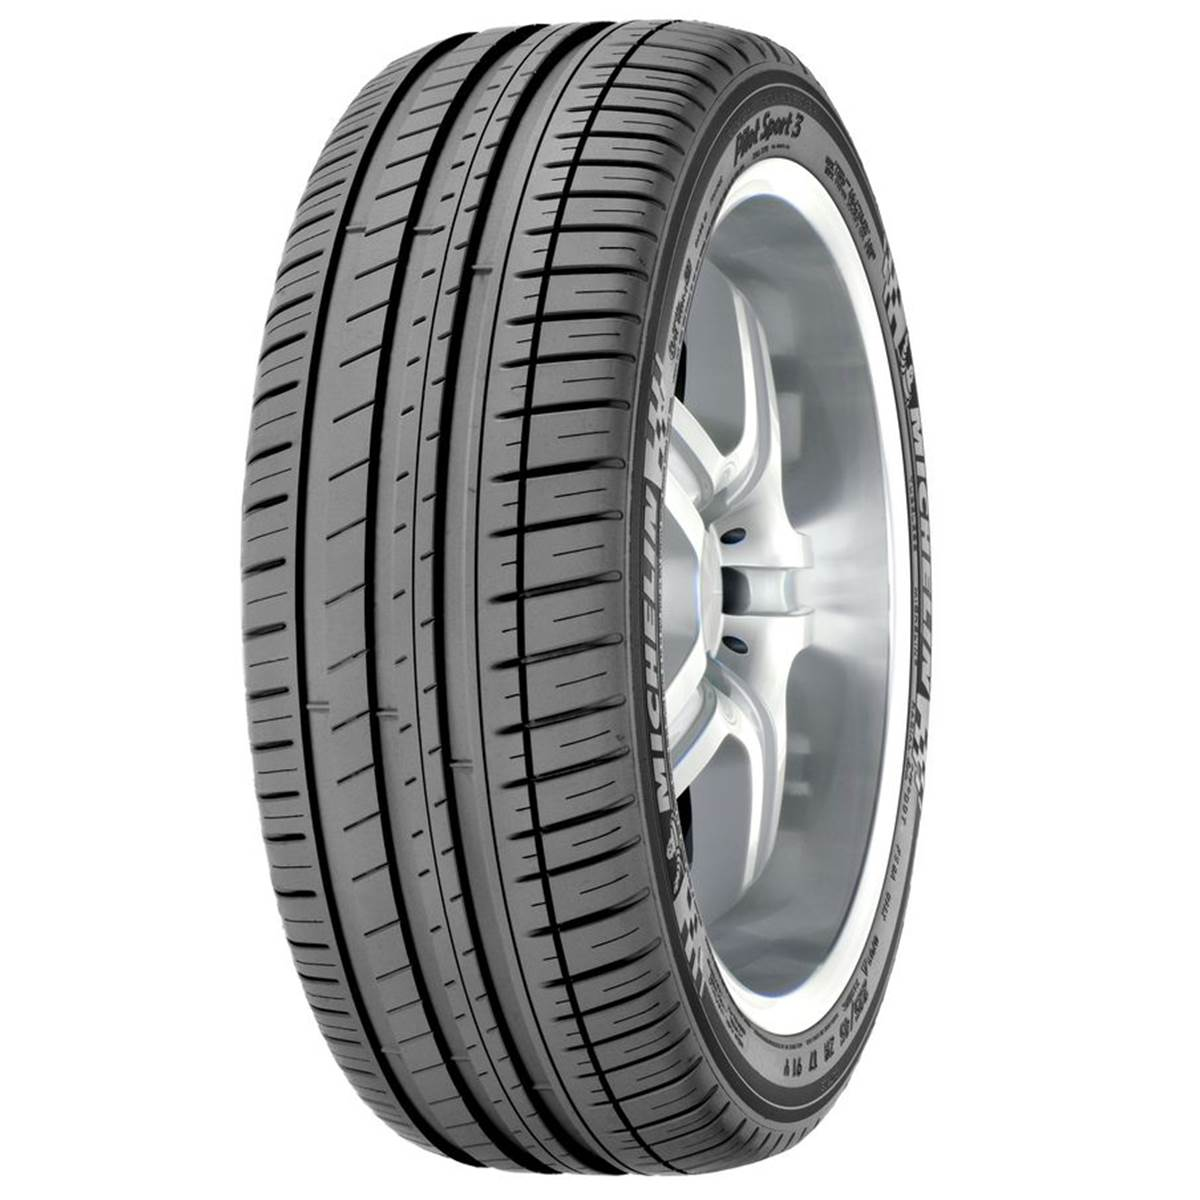 Pneu Michelin 215/40R16 86W Pilot Sport 3 XL